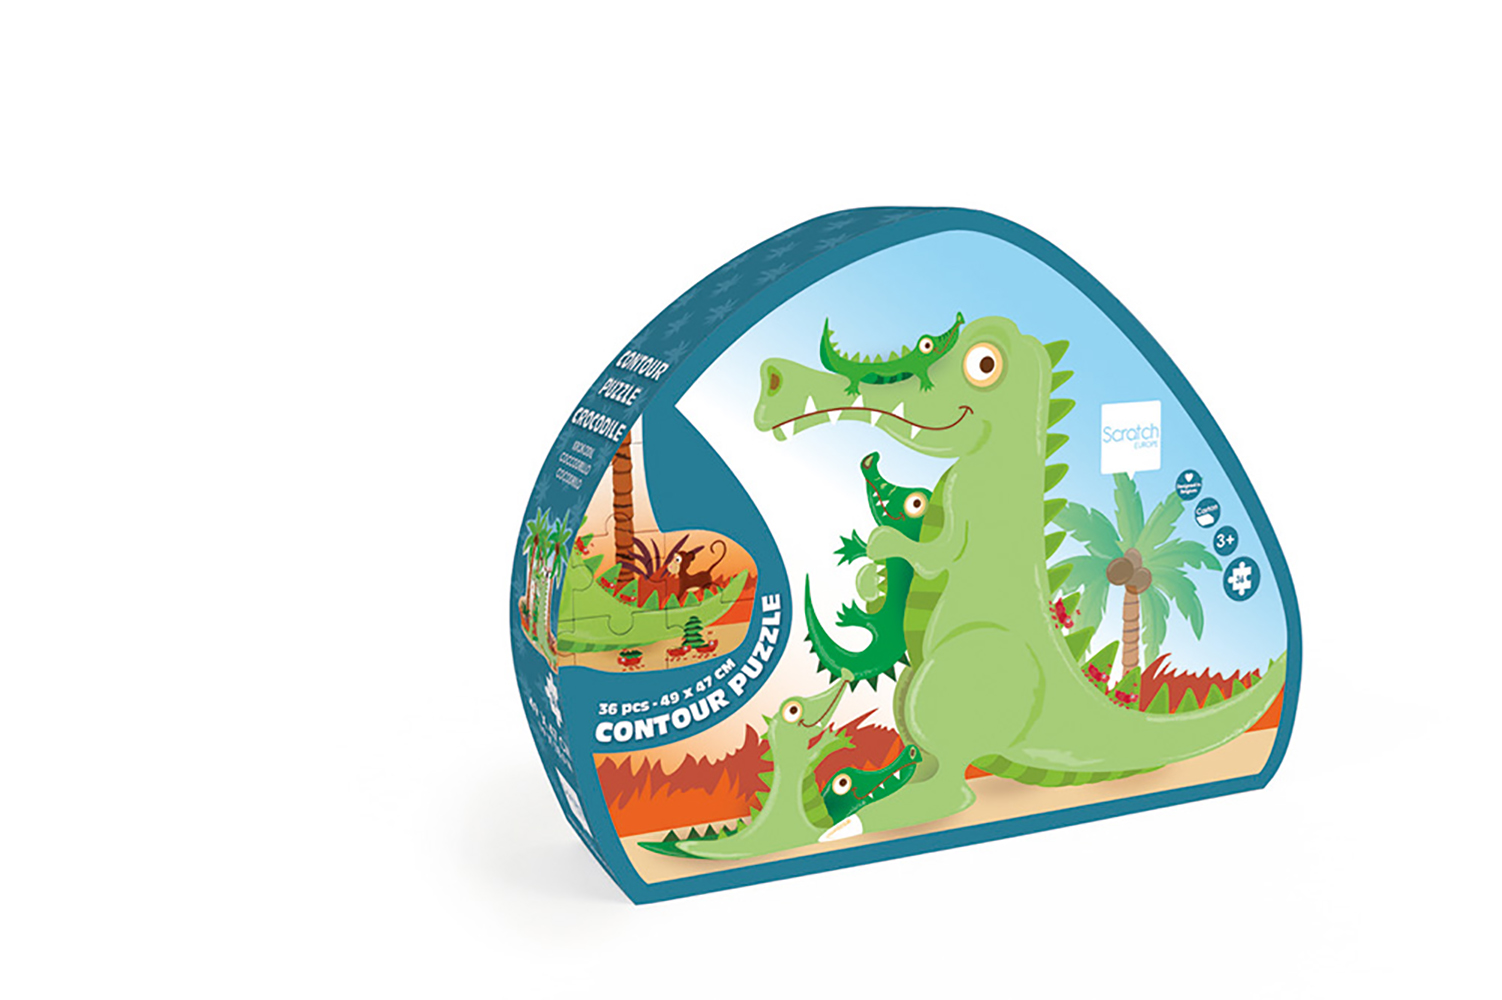 Scratch - Contour Puzzle Crocodile 36 pieces